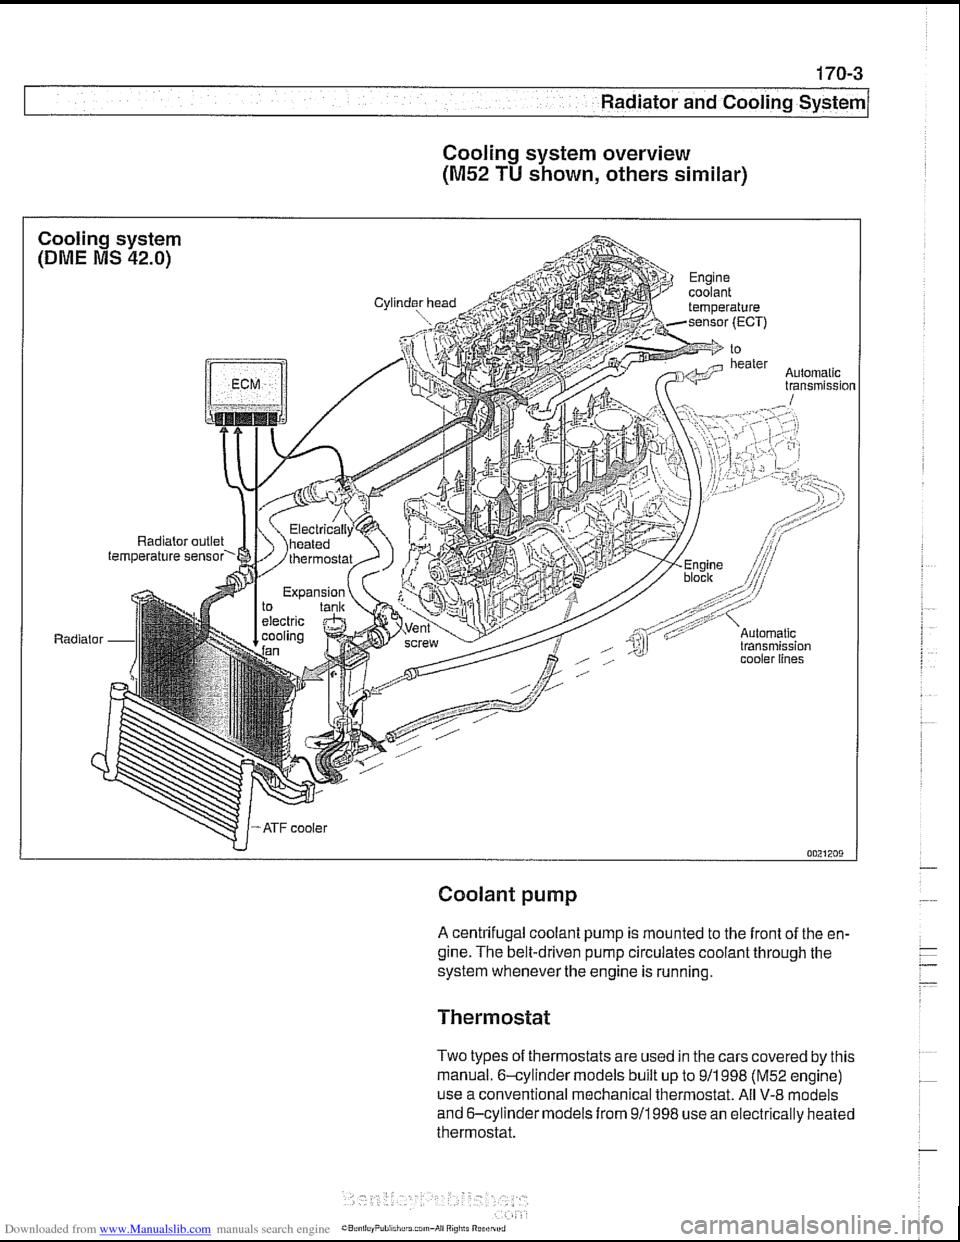 Engine Coolant Bmw 525i 2000 E39 Workshop Manual Expansion Tank